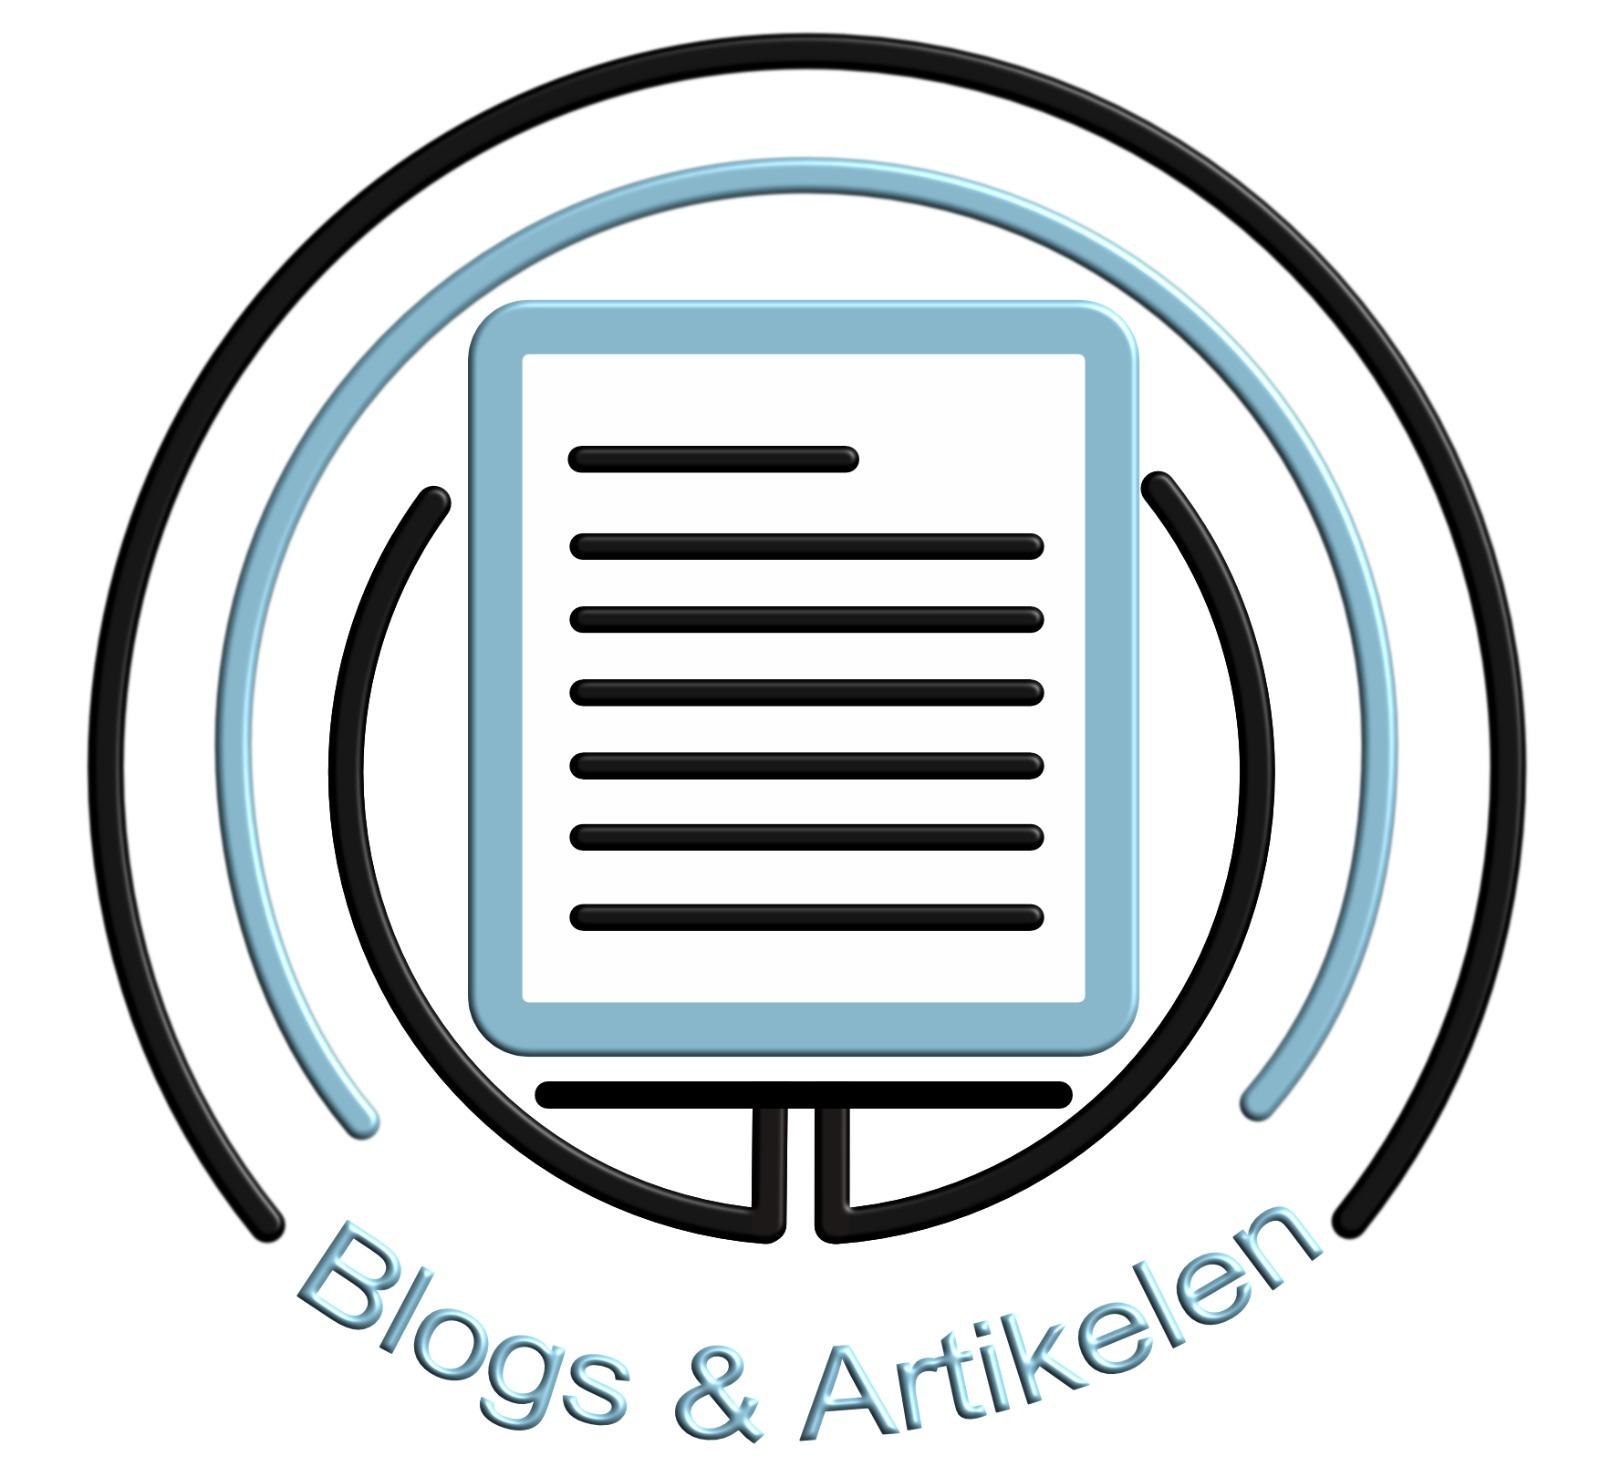 logo blogs en artikelen